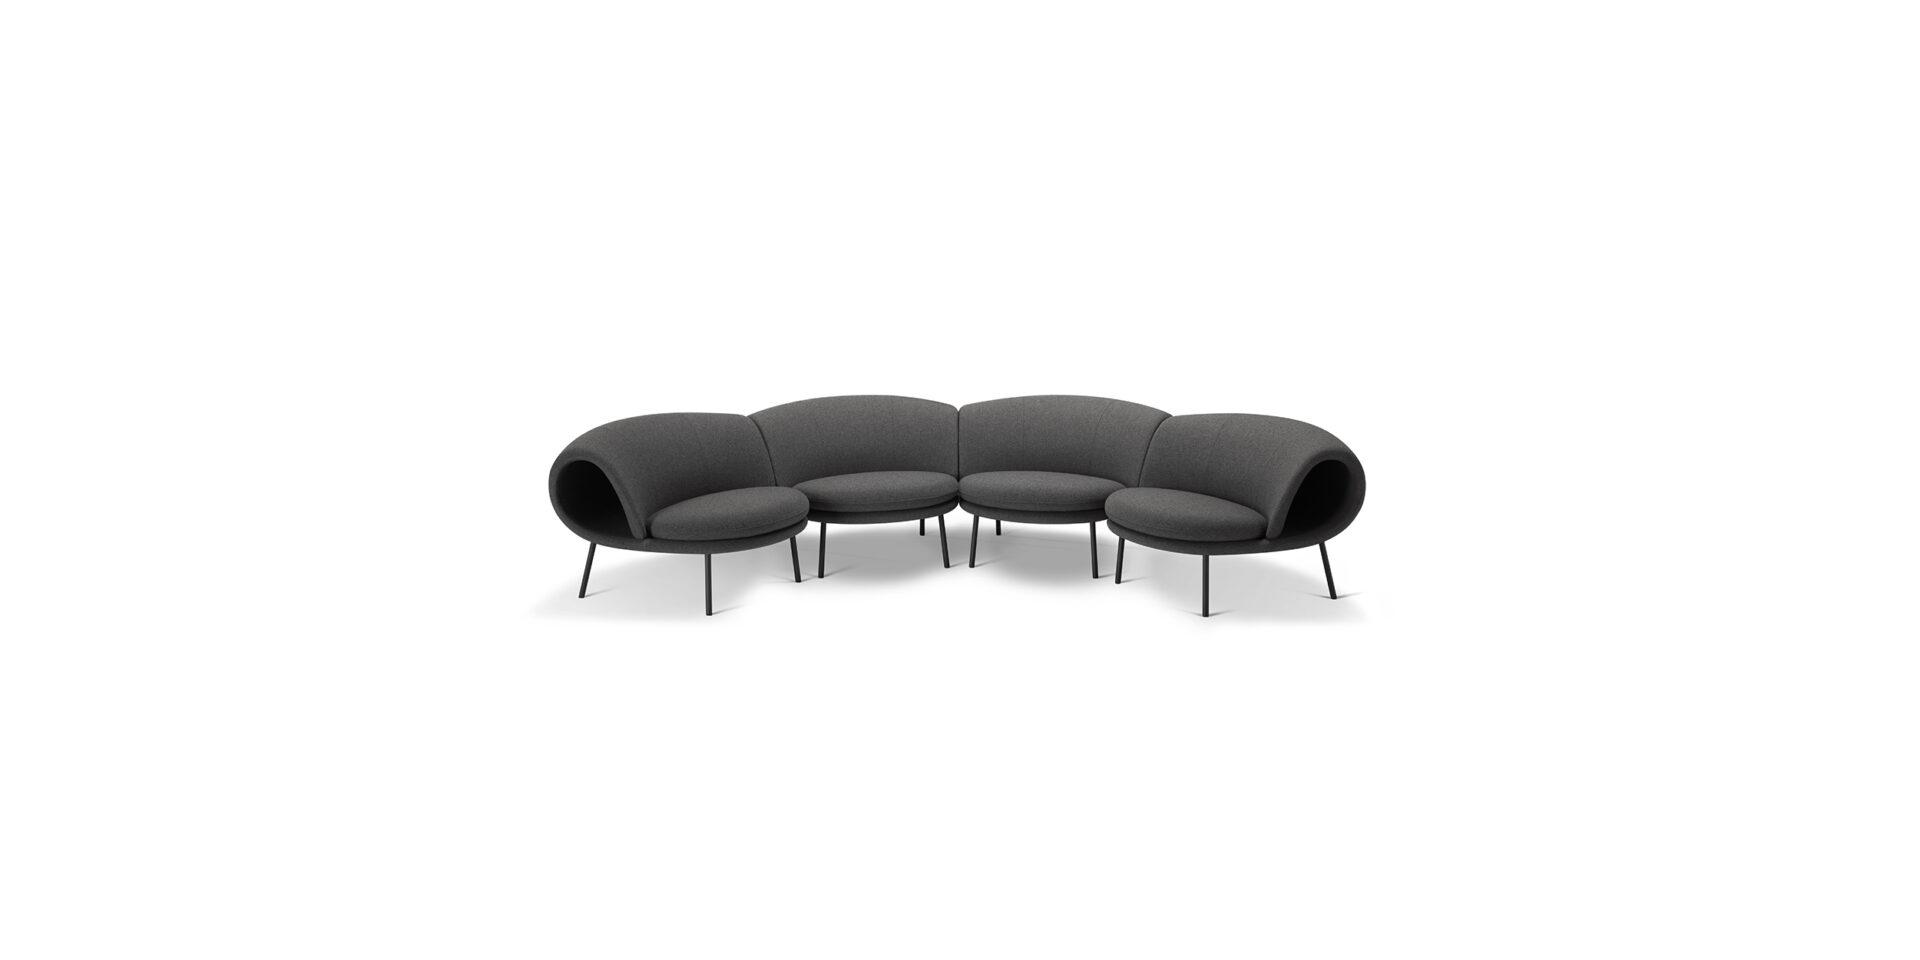 Maki-Easy-chairs-Jin-Kuramoto-offecct-15270-1